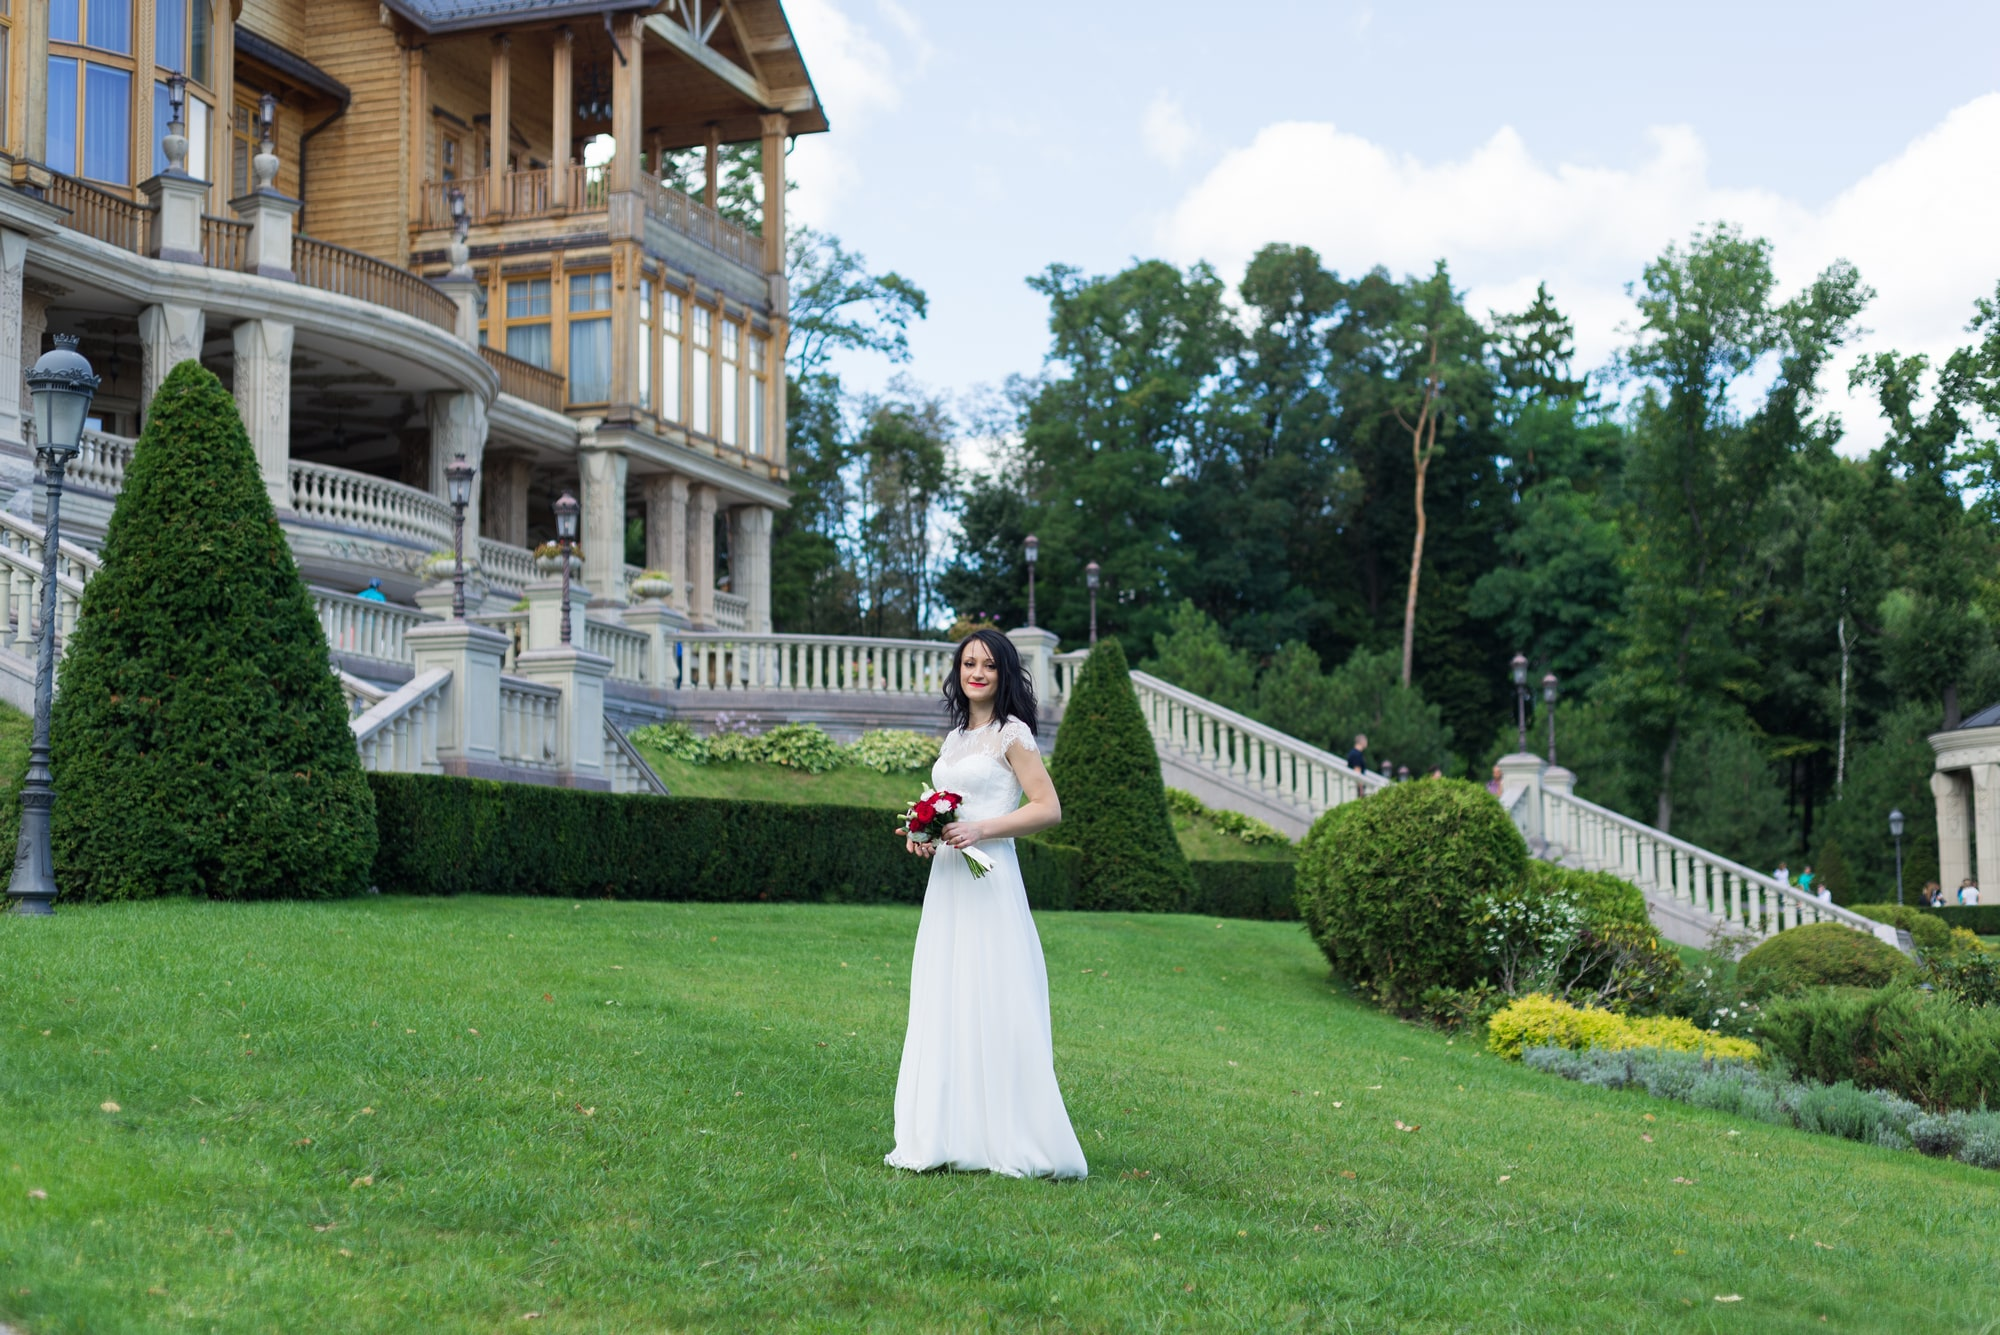 Свадебная фотосъемка в августе - невеста на травке